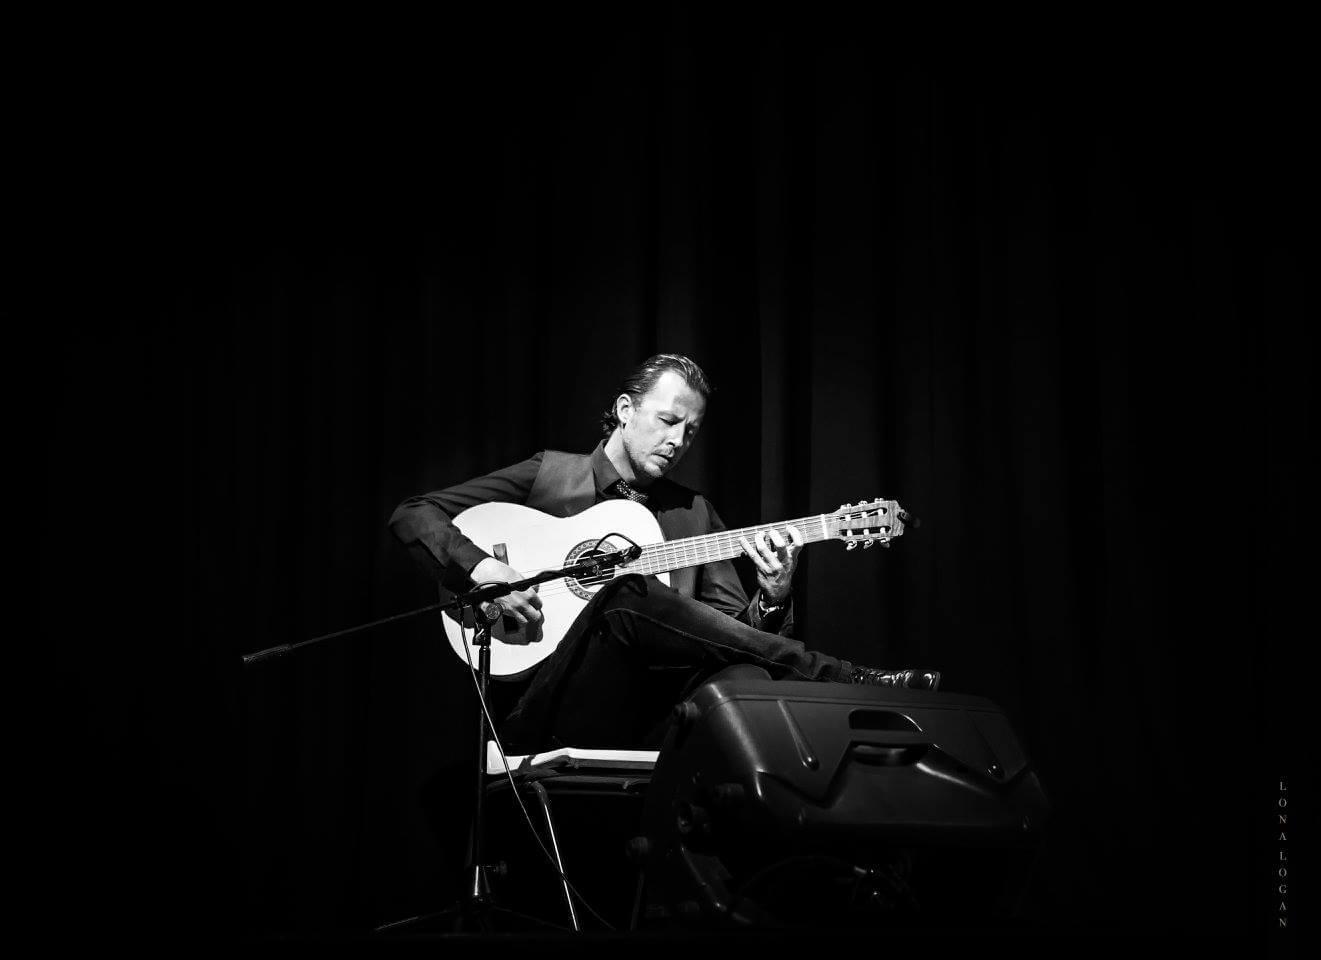 Damian Wright